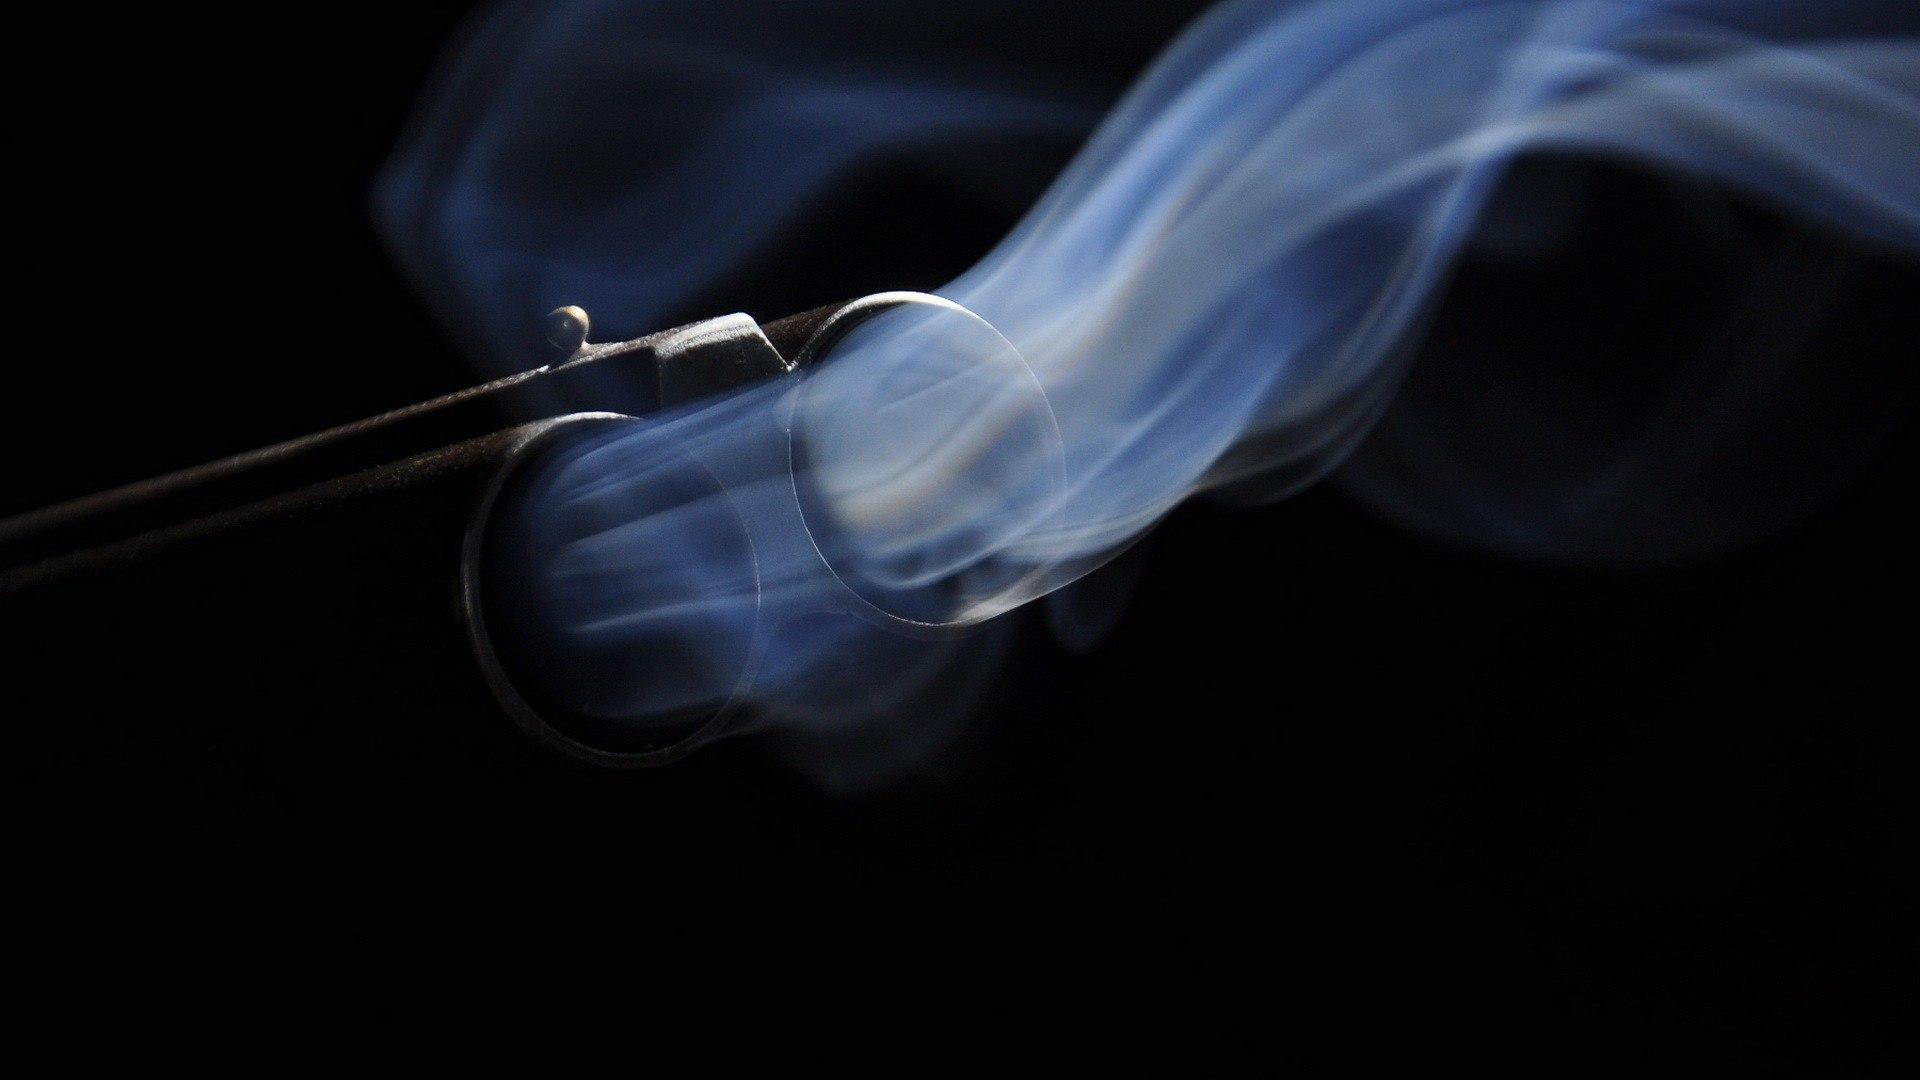 _____smoke_after_a_shot_from_shotgun_20150223_1764645260